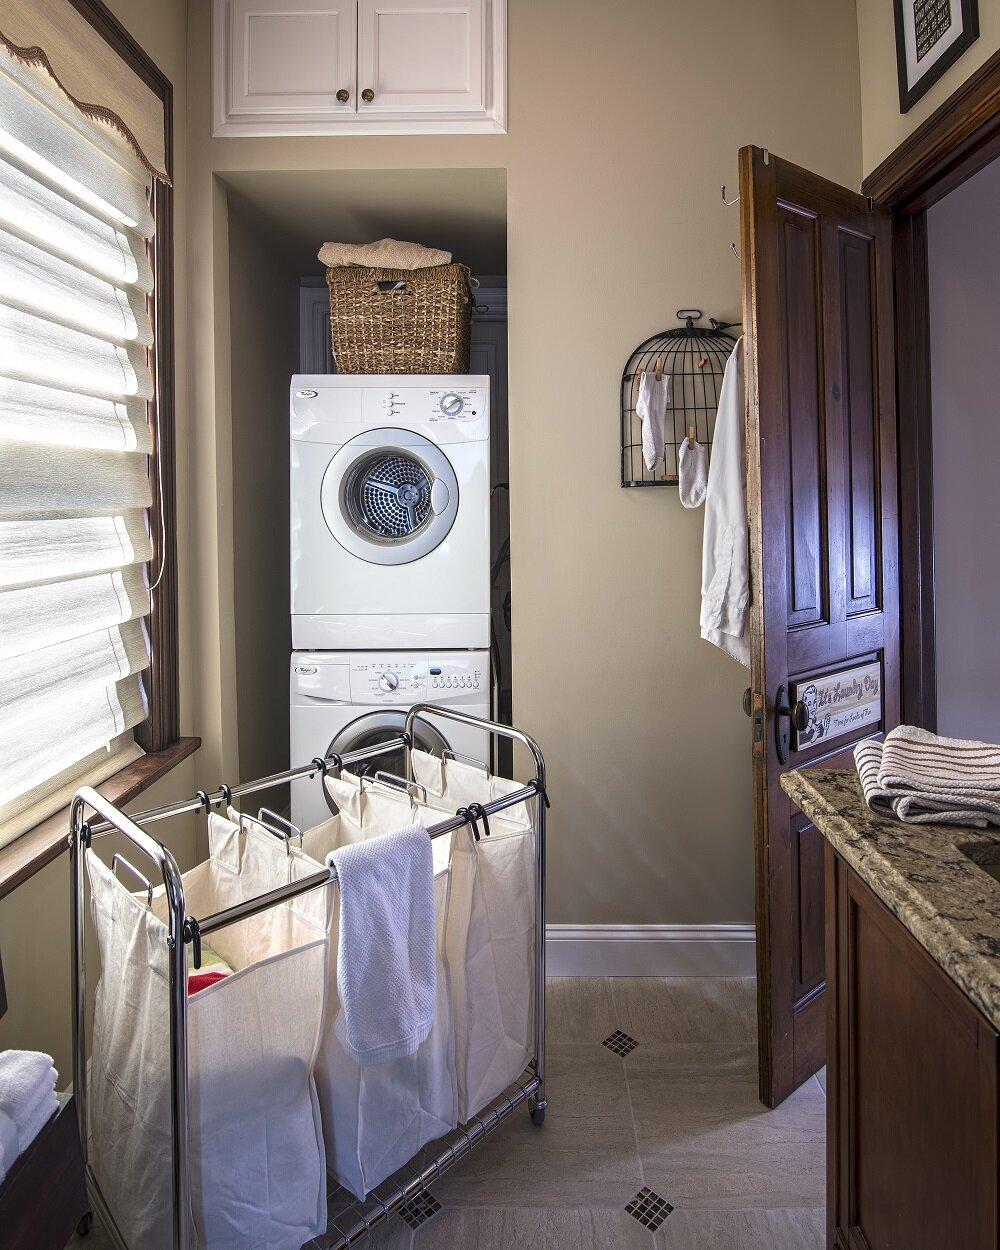 Bailiwick Laundry Room FS.jpg